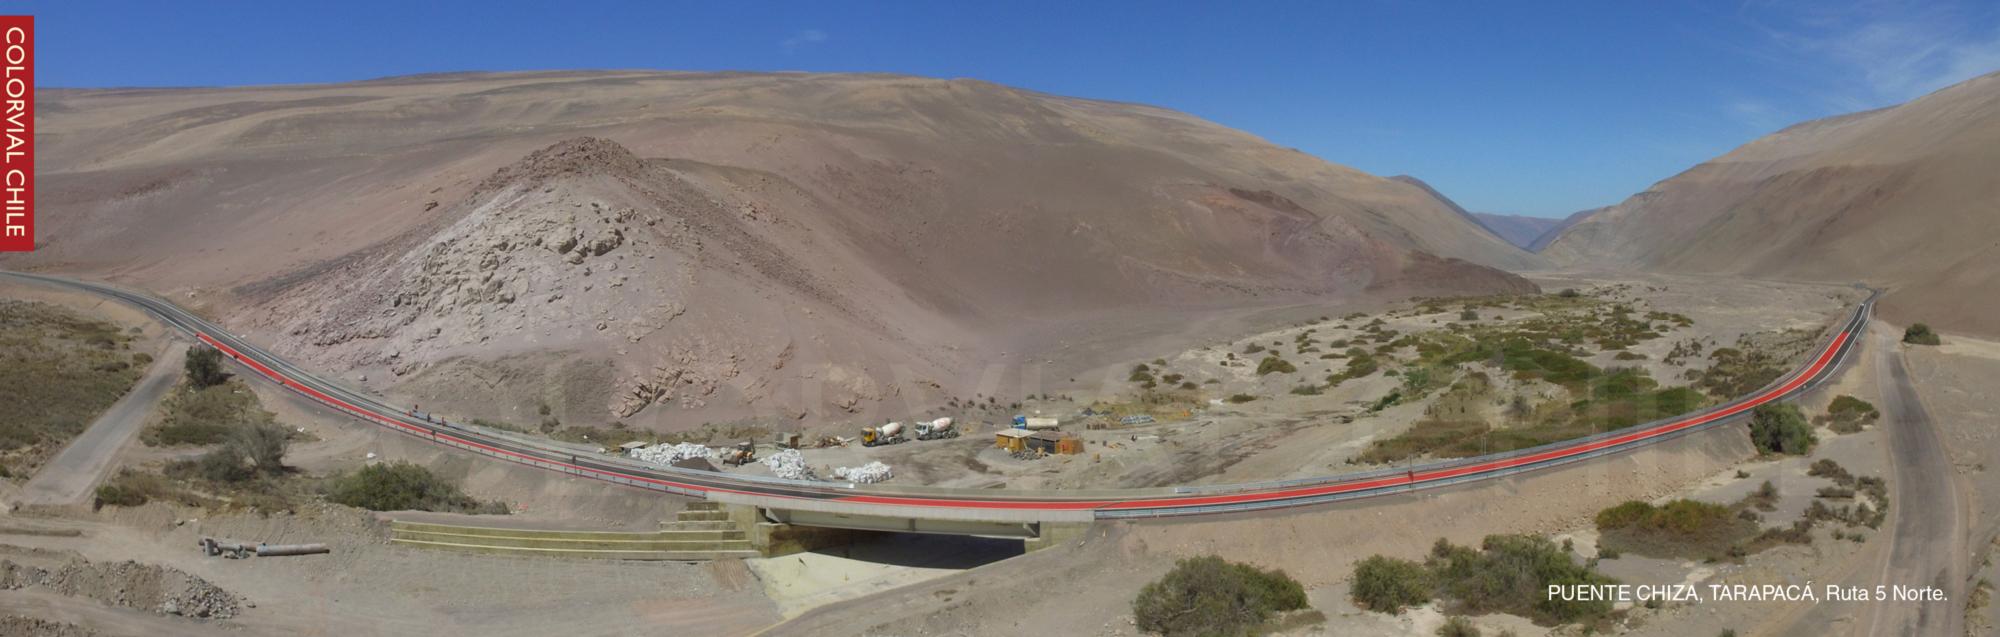 Puente Chiza, Ruta 5 Norte